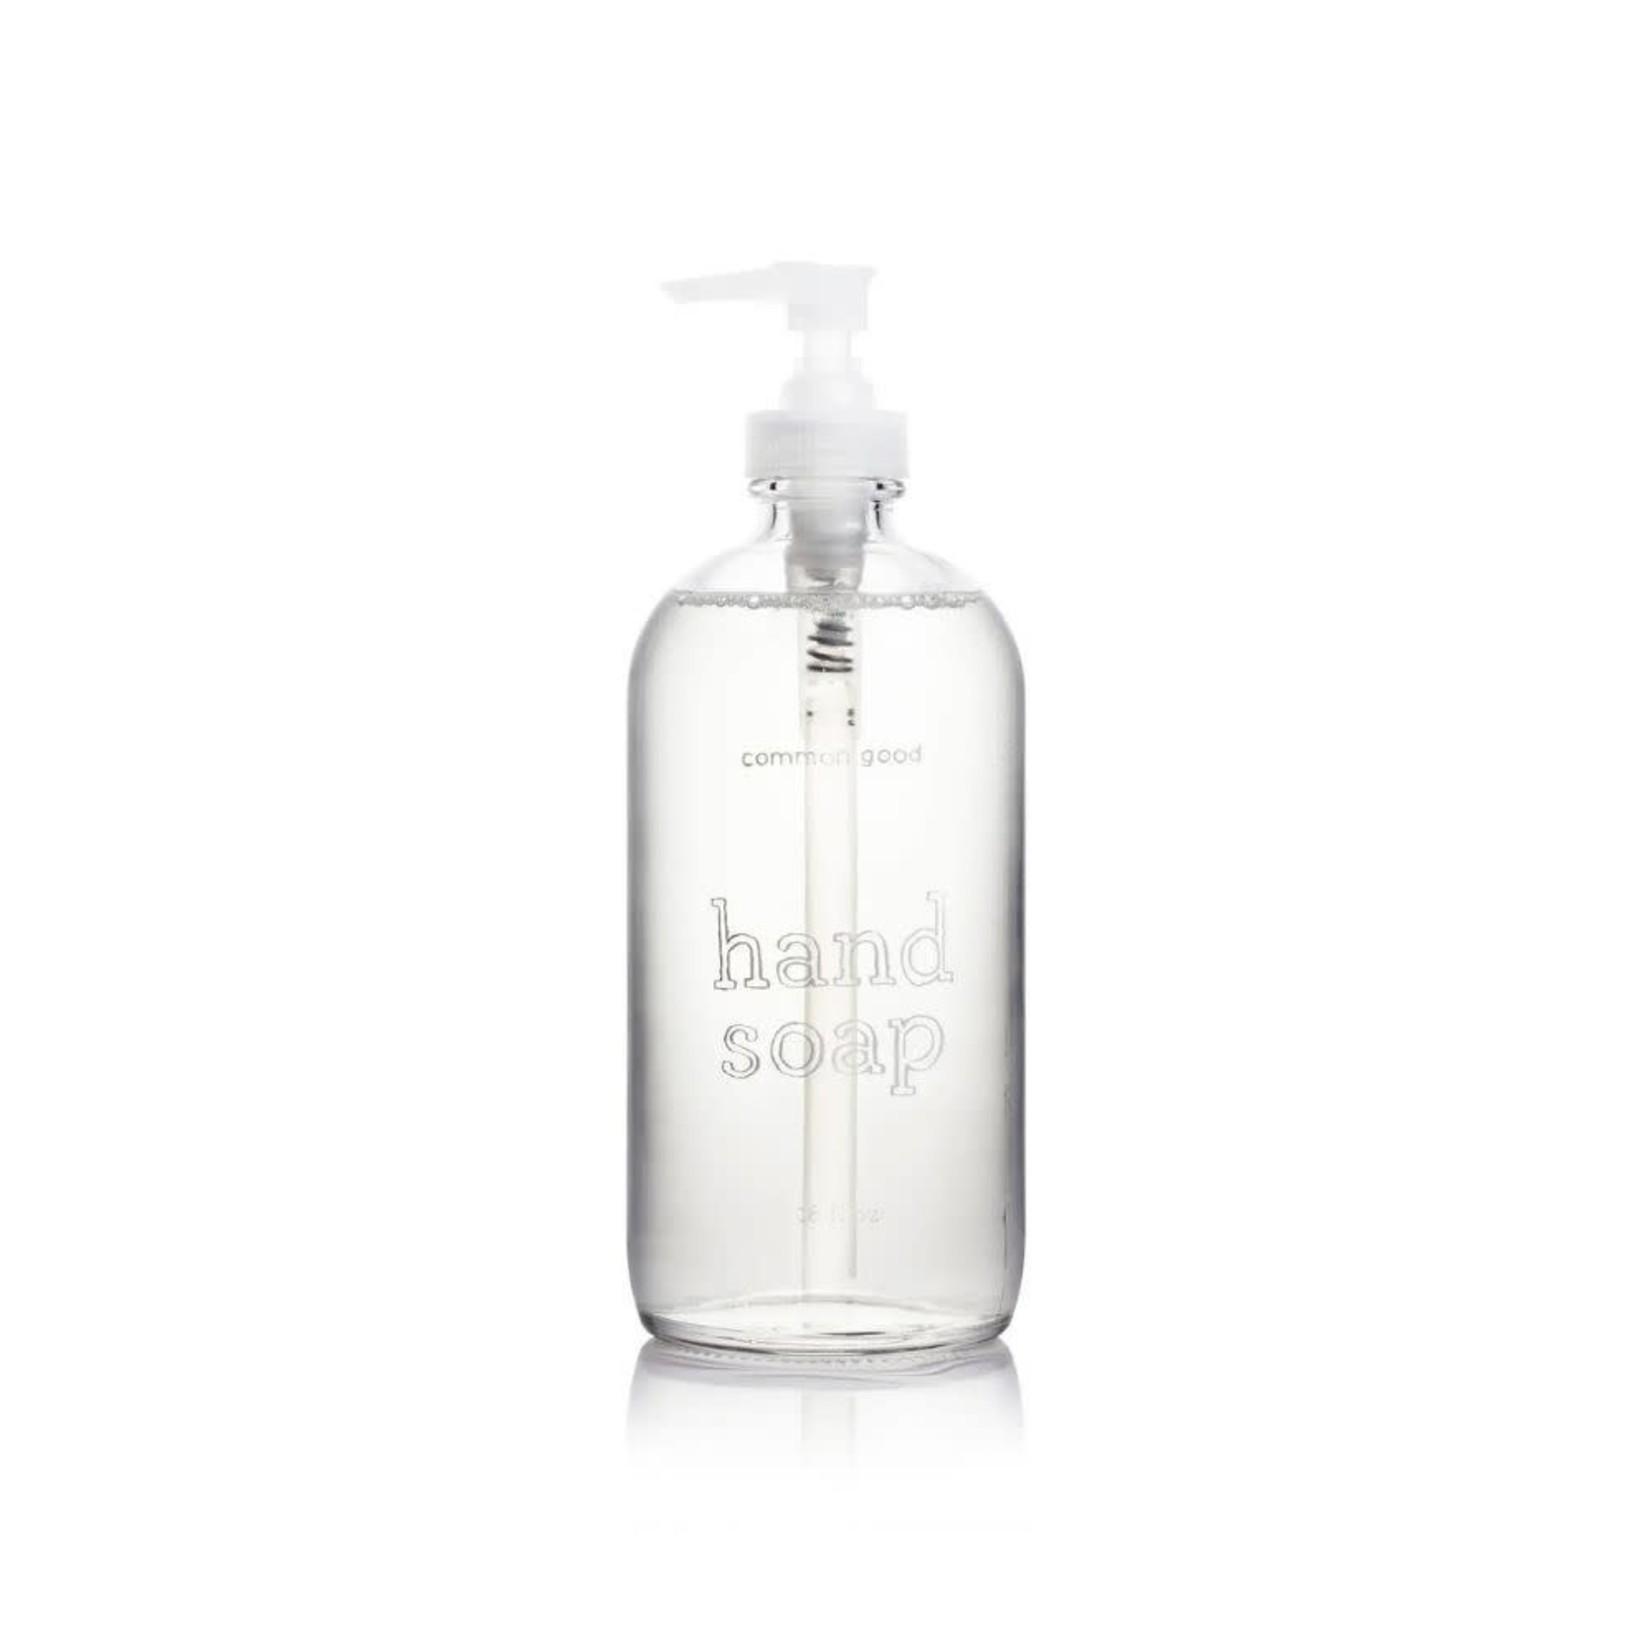 16oz Glass Bottle, Hand Soap